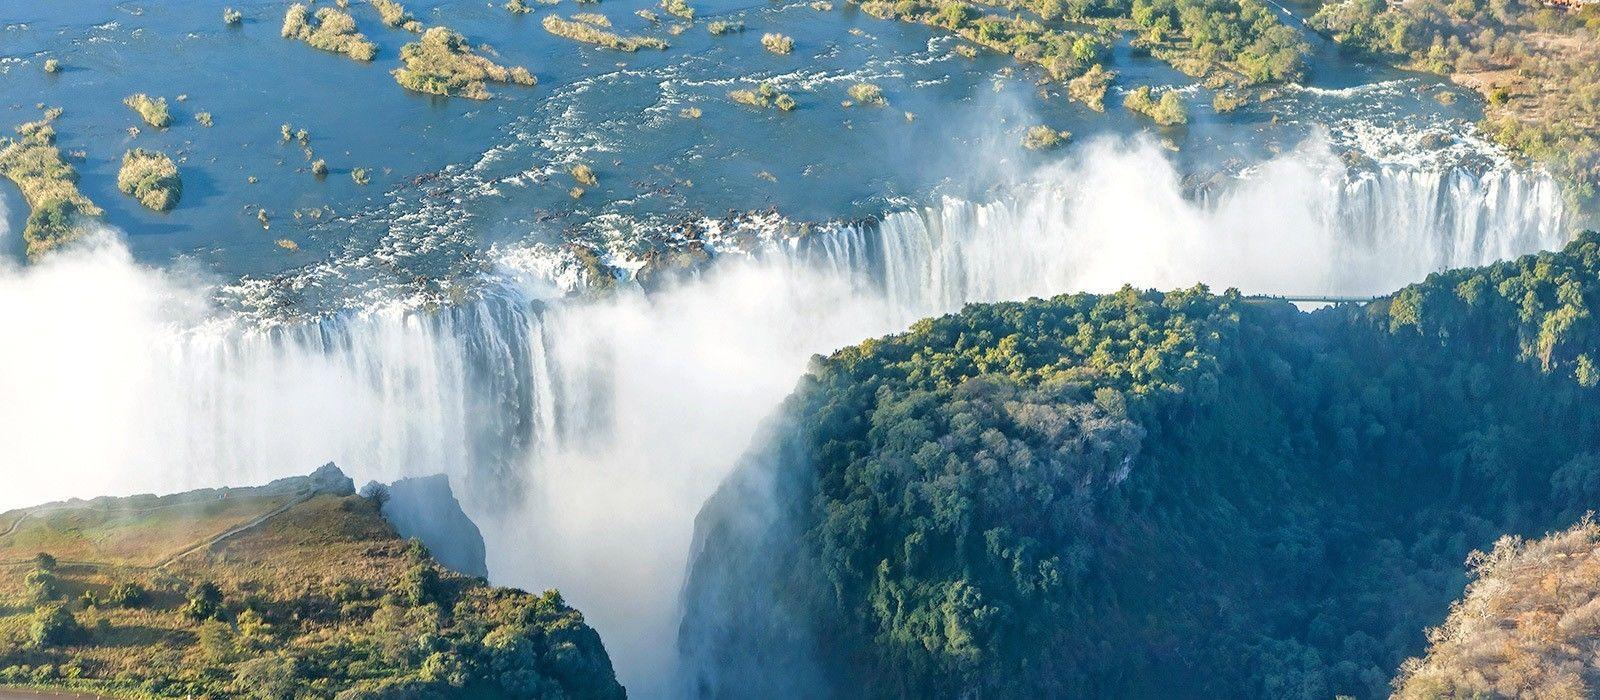 Simbabwe Reise: Klassisch & Hautnah Urlaub 2